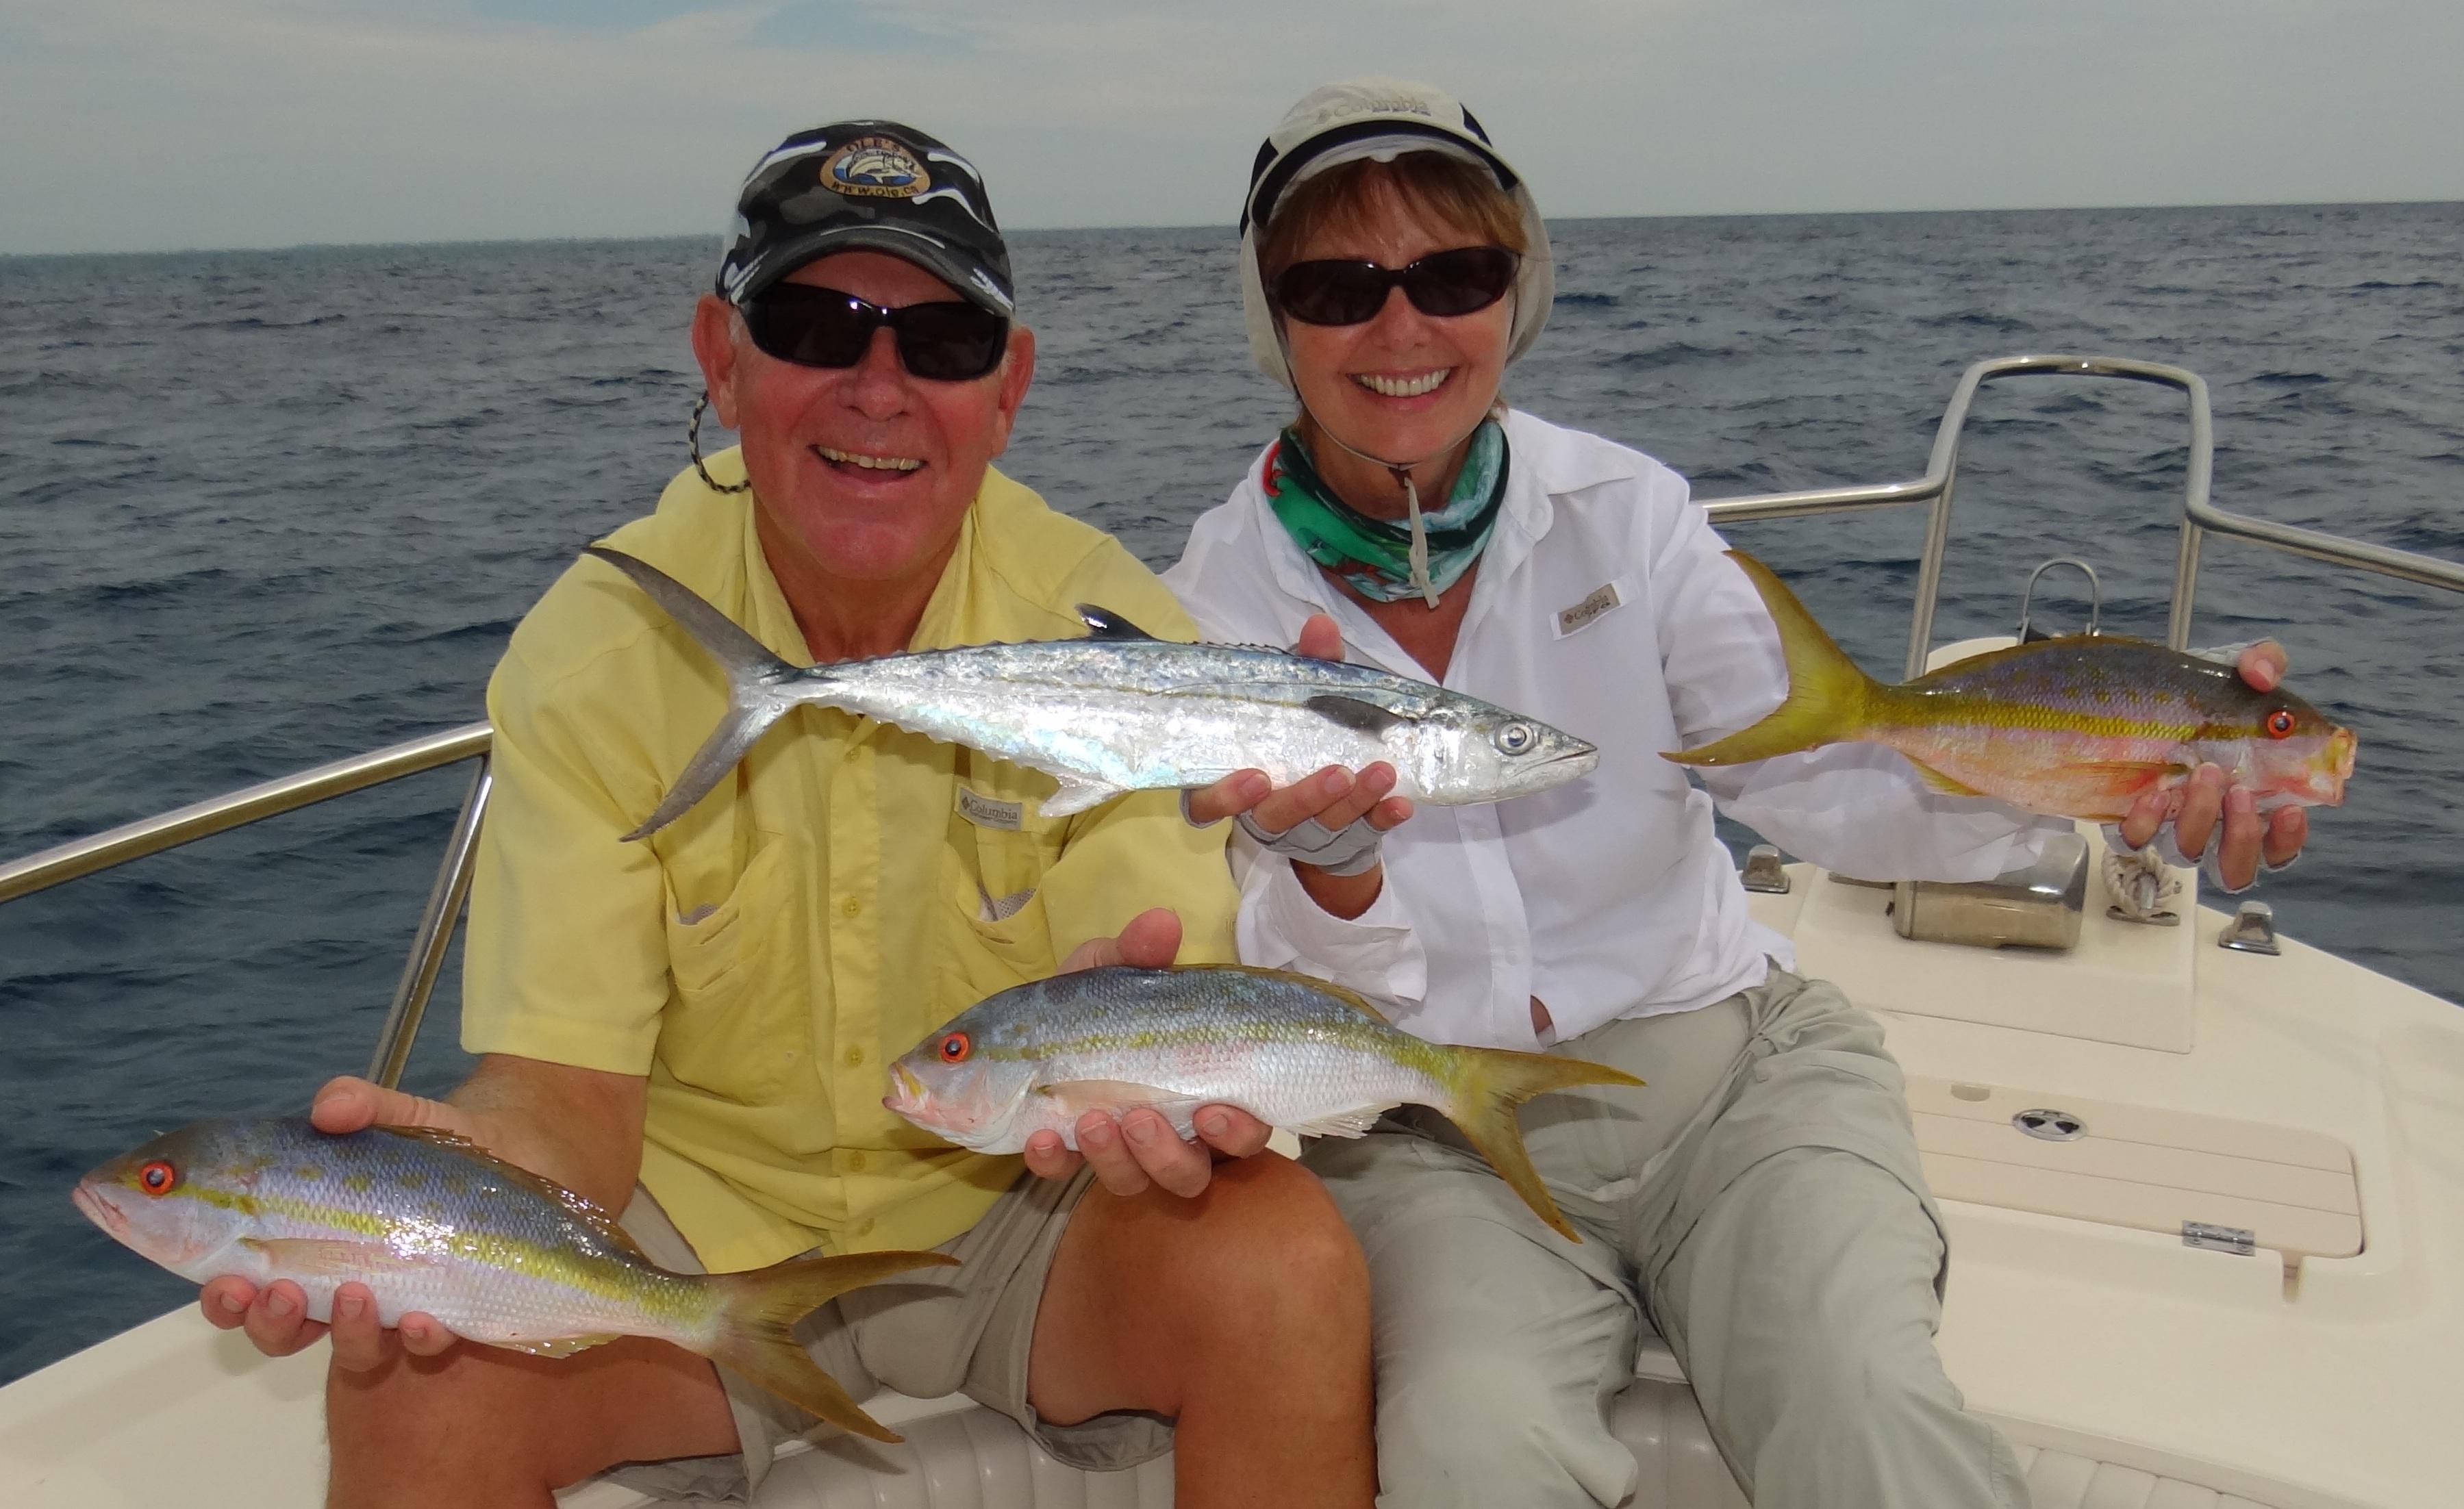 Florida keys mackerel fishing seasquared charters for Marathon fishing report